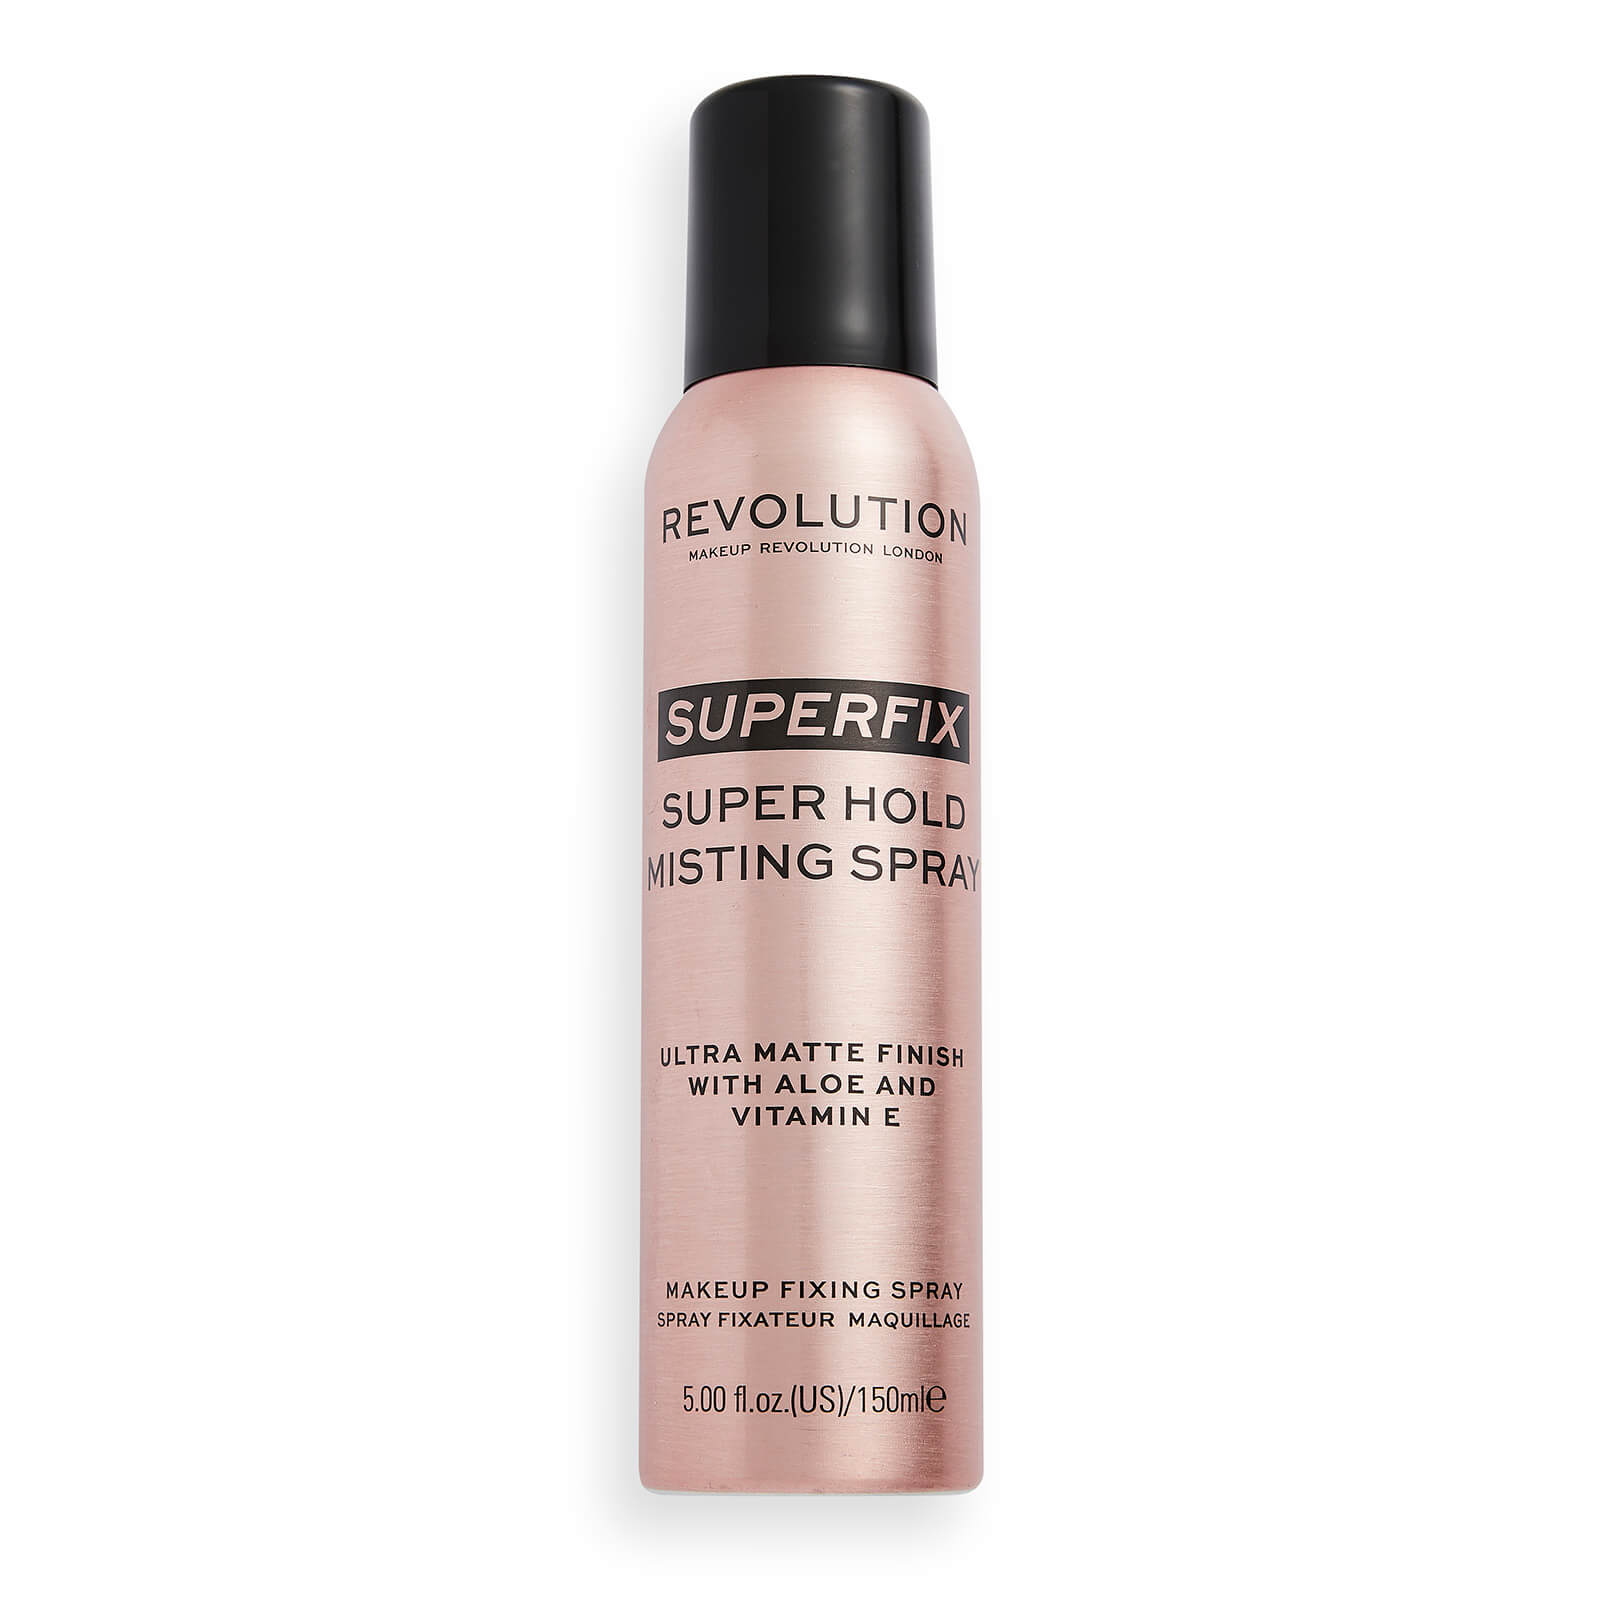 Купить Revolution Superfix Misting Spray 150ml